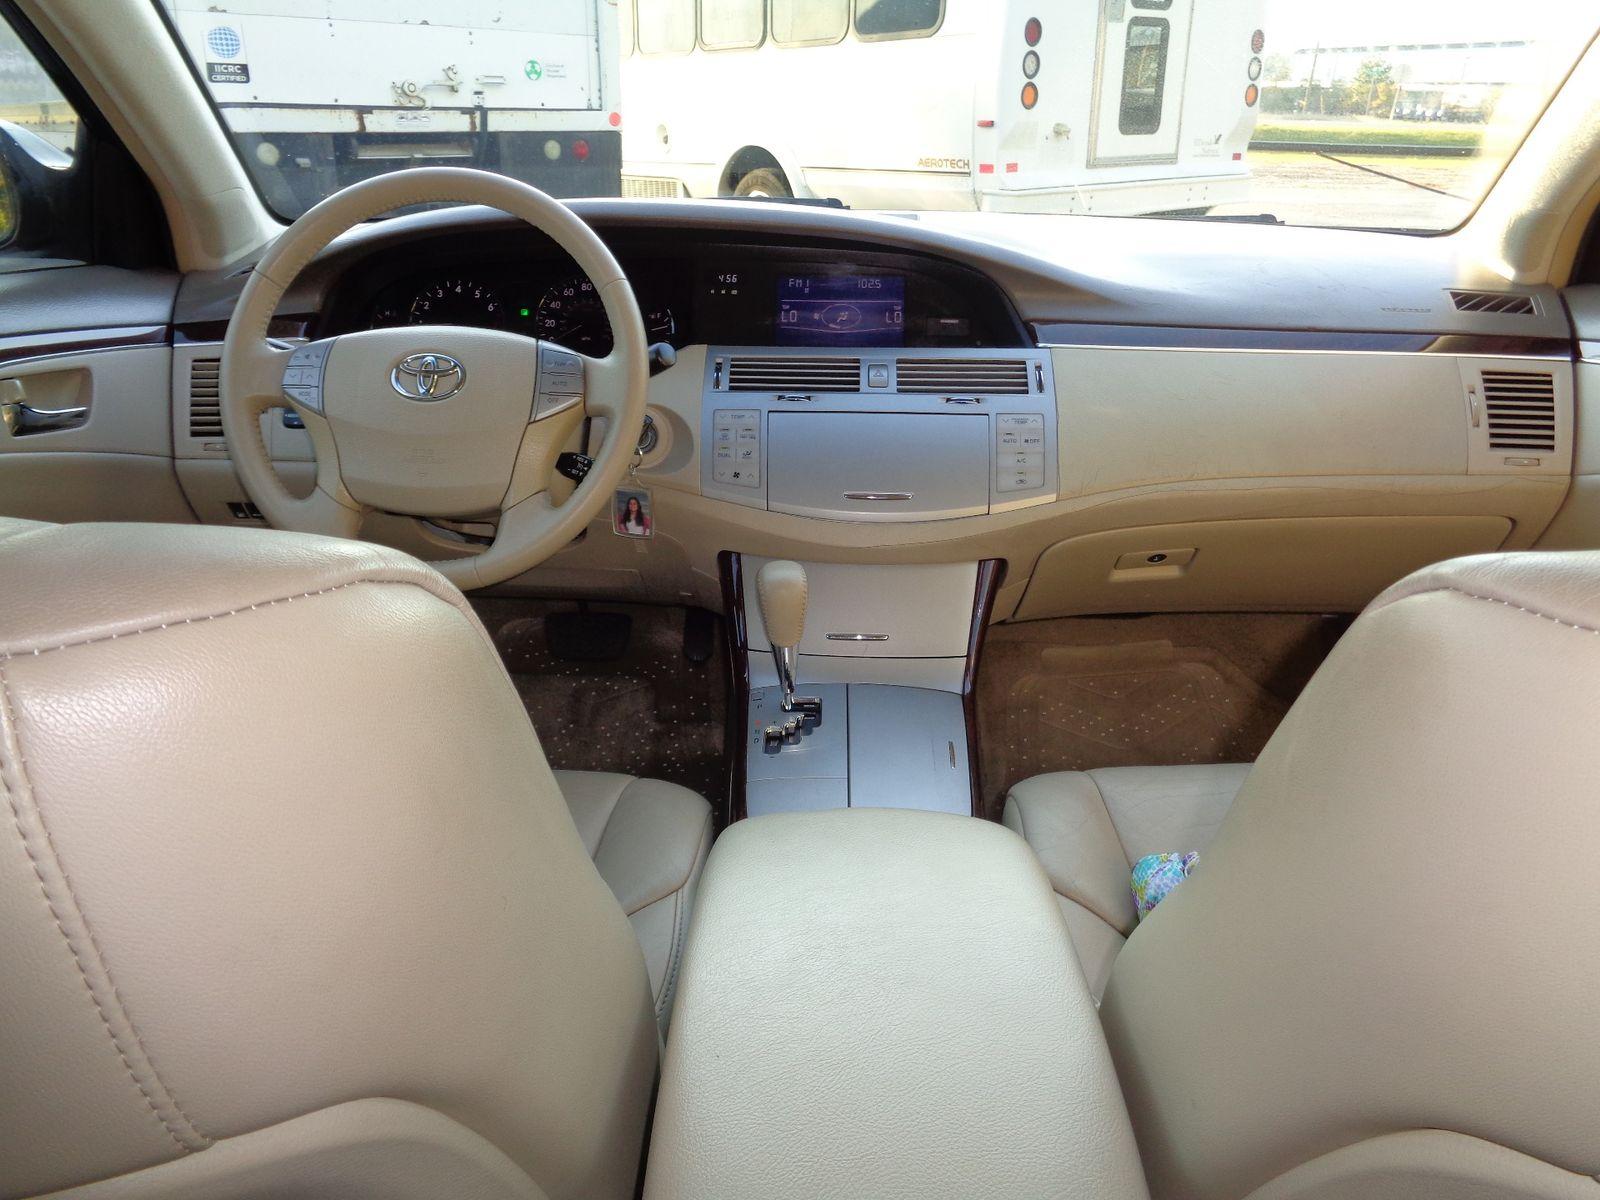 2010 Toyota Avalon XLS city Louisiana Nationwide Auto Sales